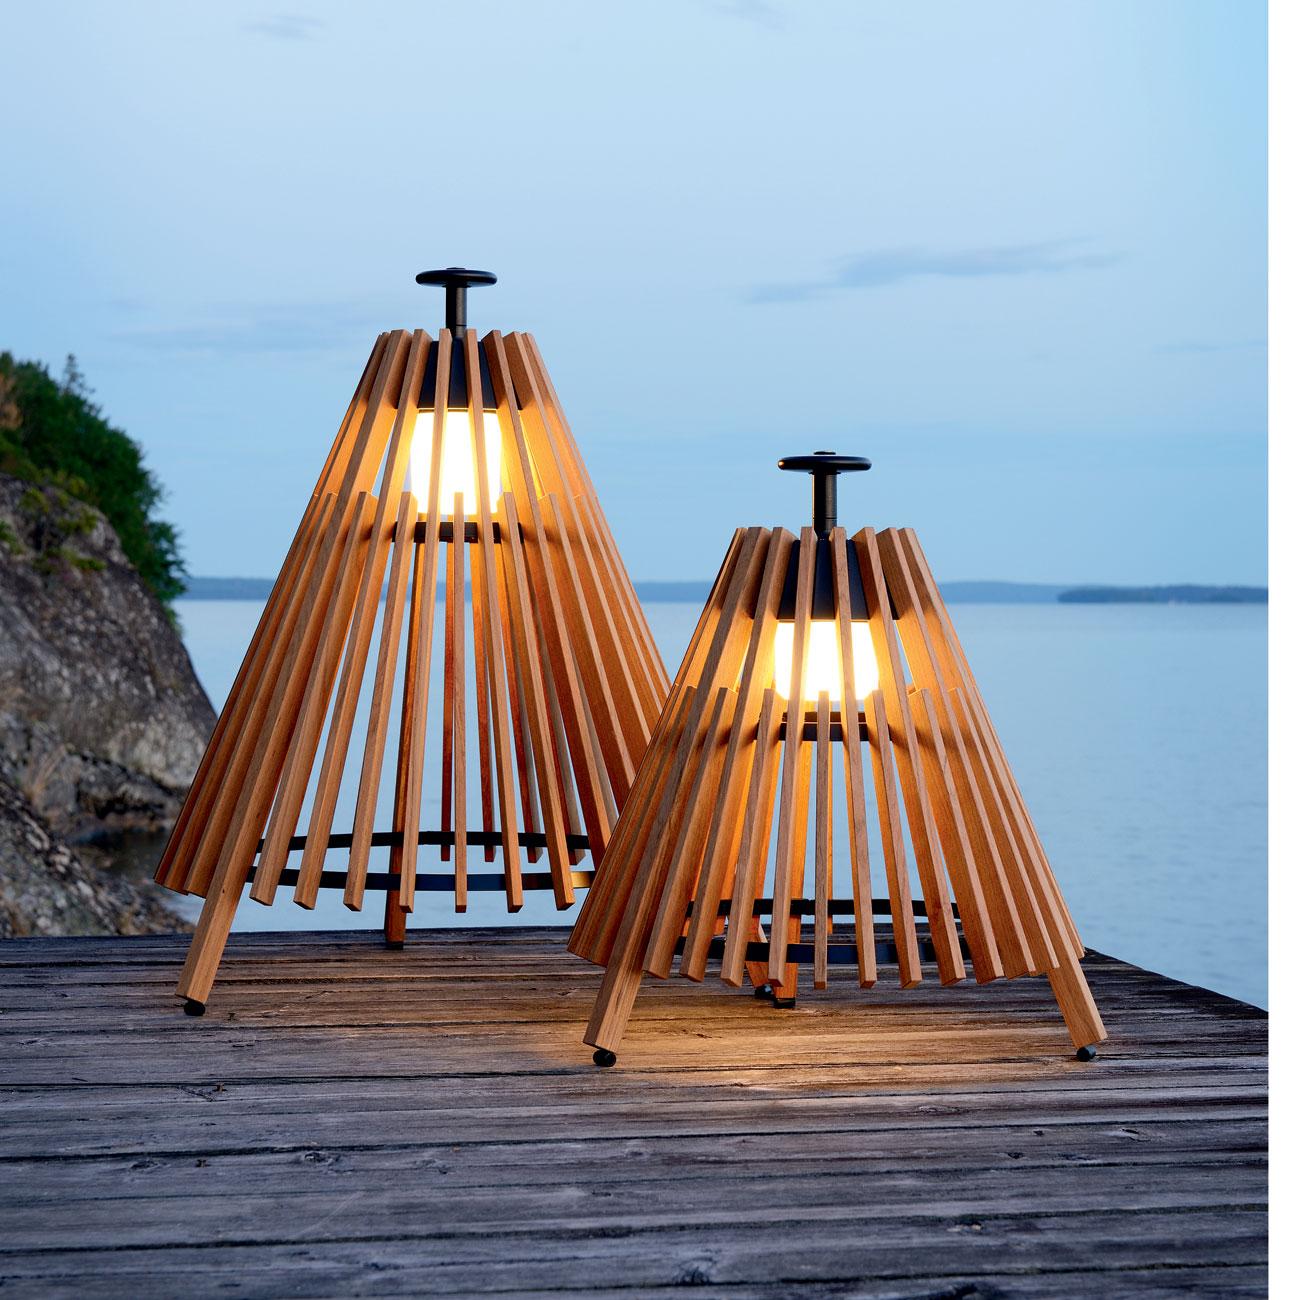 Tipi Lamp Luxury Outdoor Living International Shipping